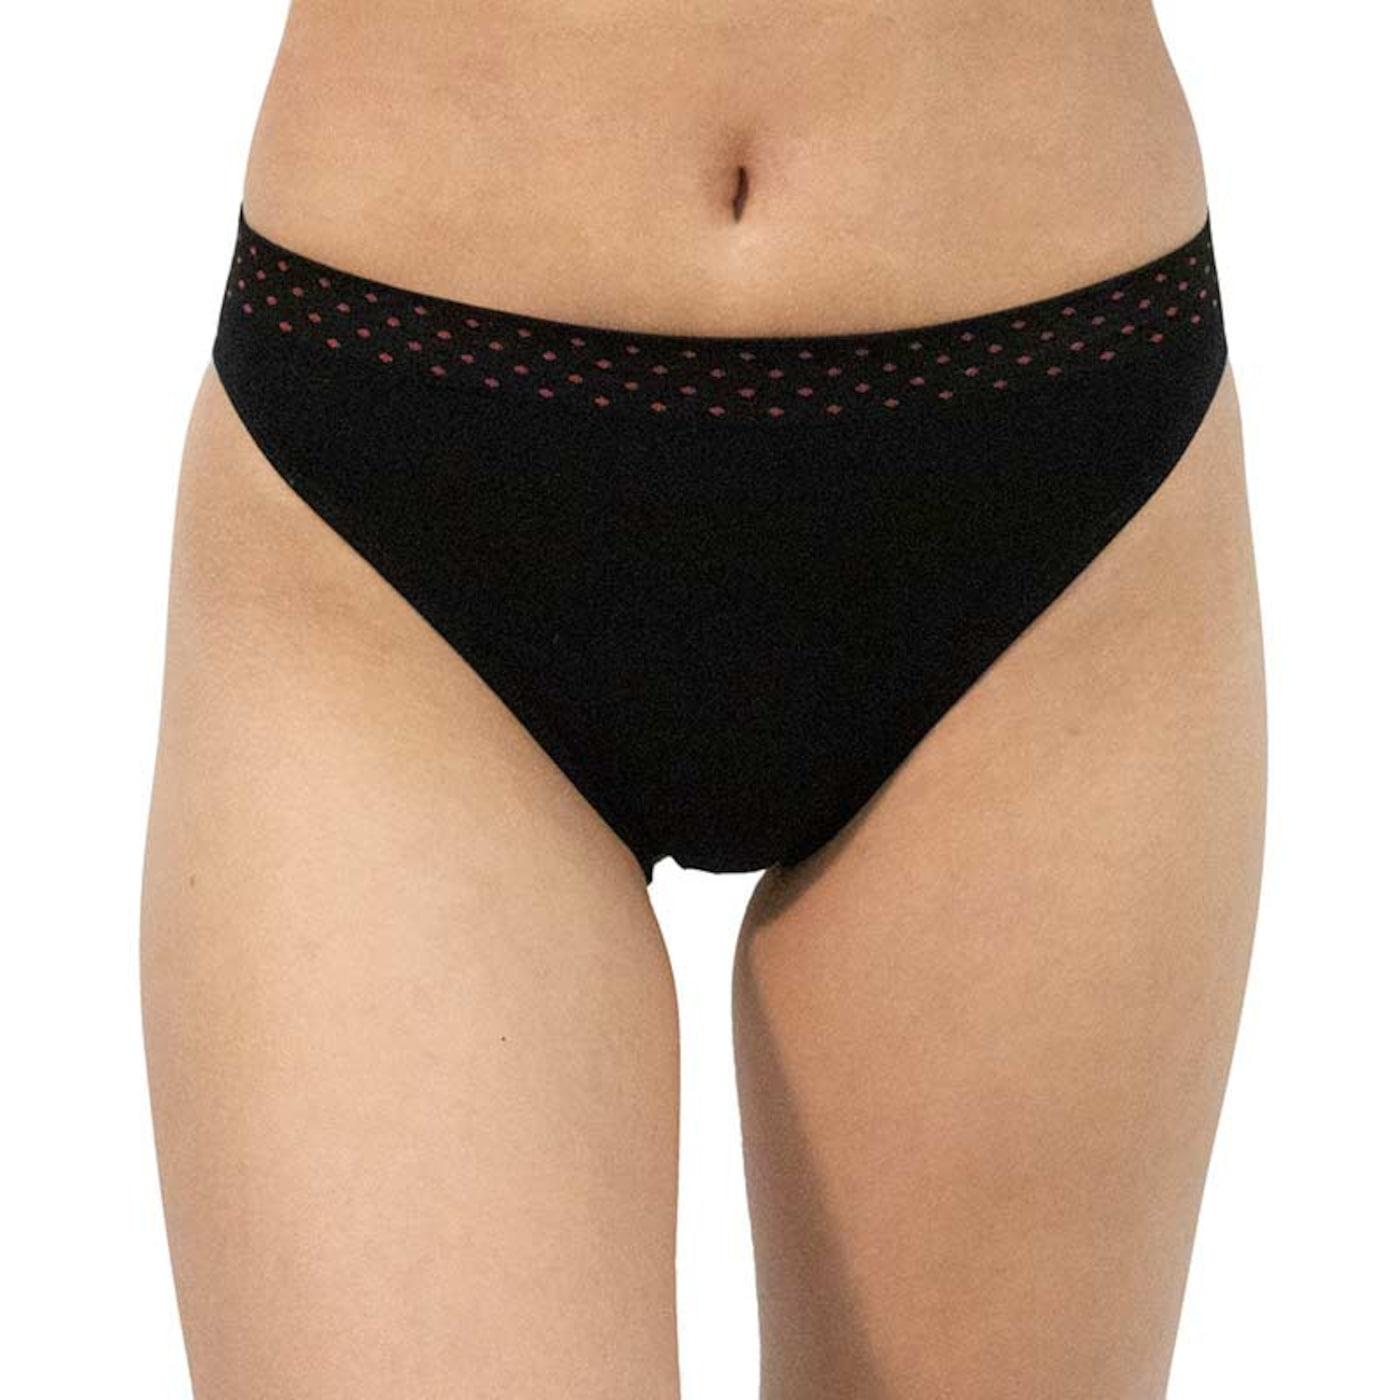 Women's panties Gina black  dámské Neurčeno L